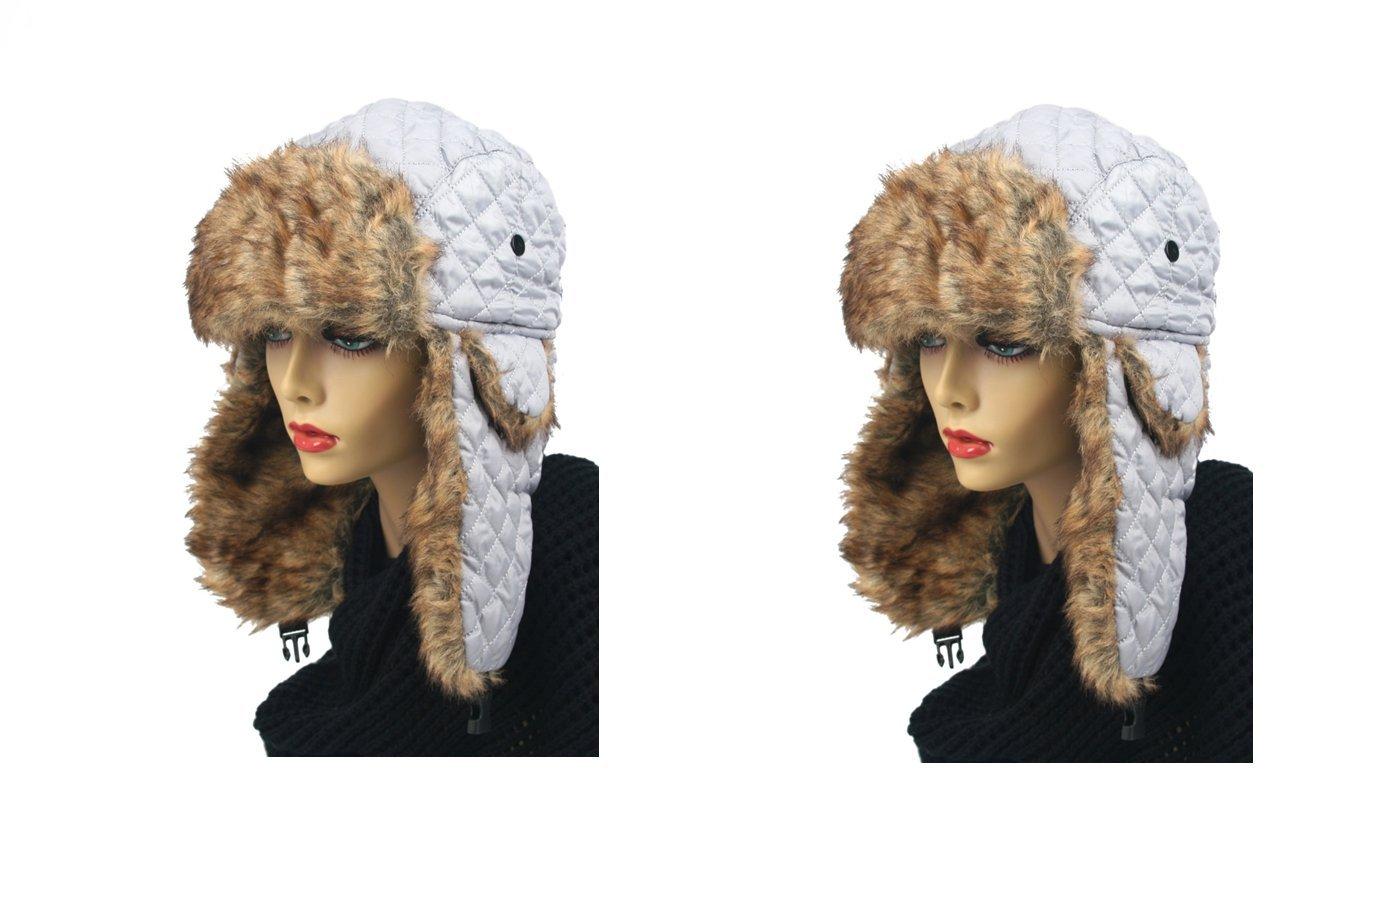 Pop Fashionwear Women's Trapper Quilted Winter Ear Flap Hat 901HT (2 pcs Light Gray & Light Gray)